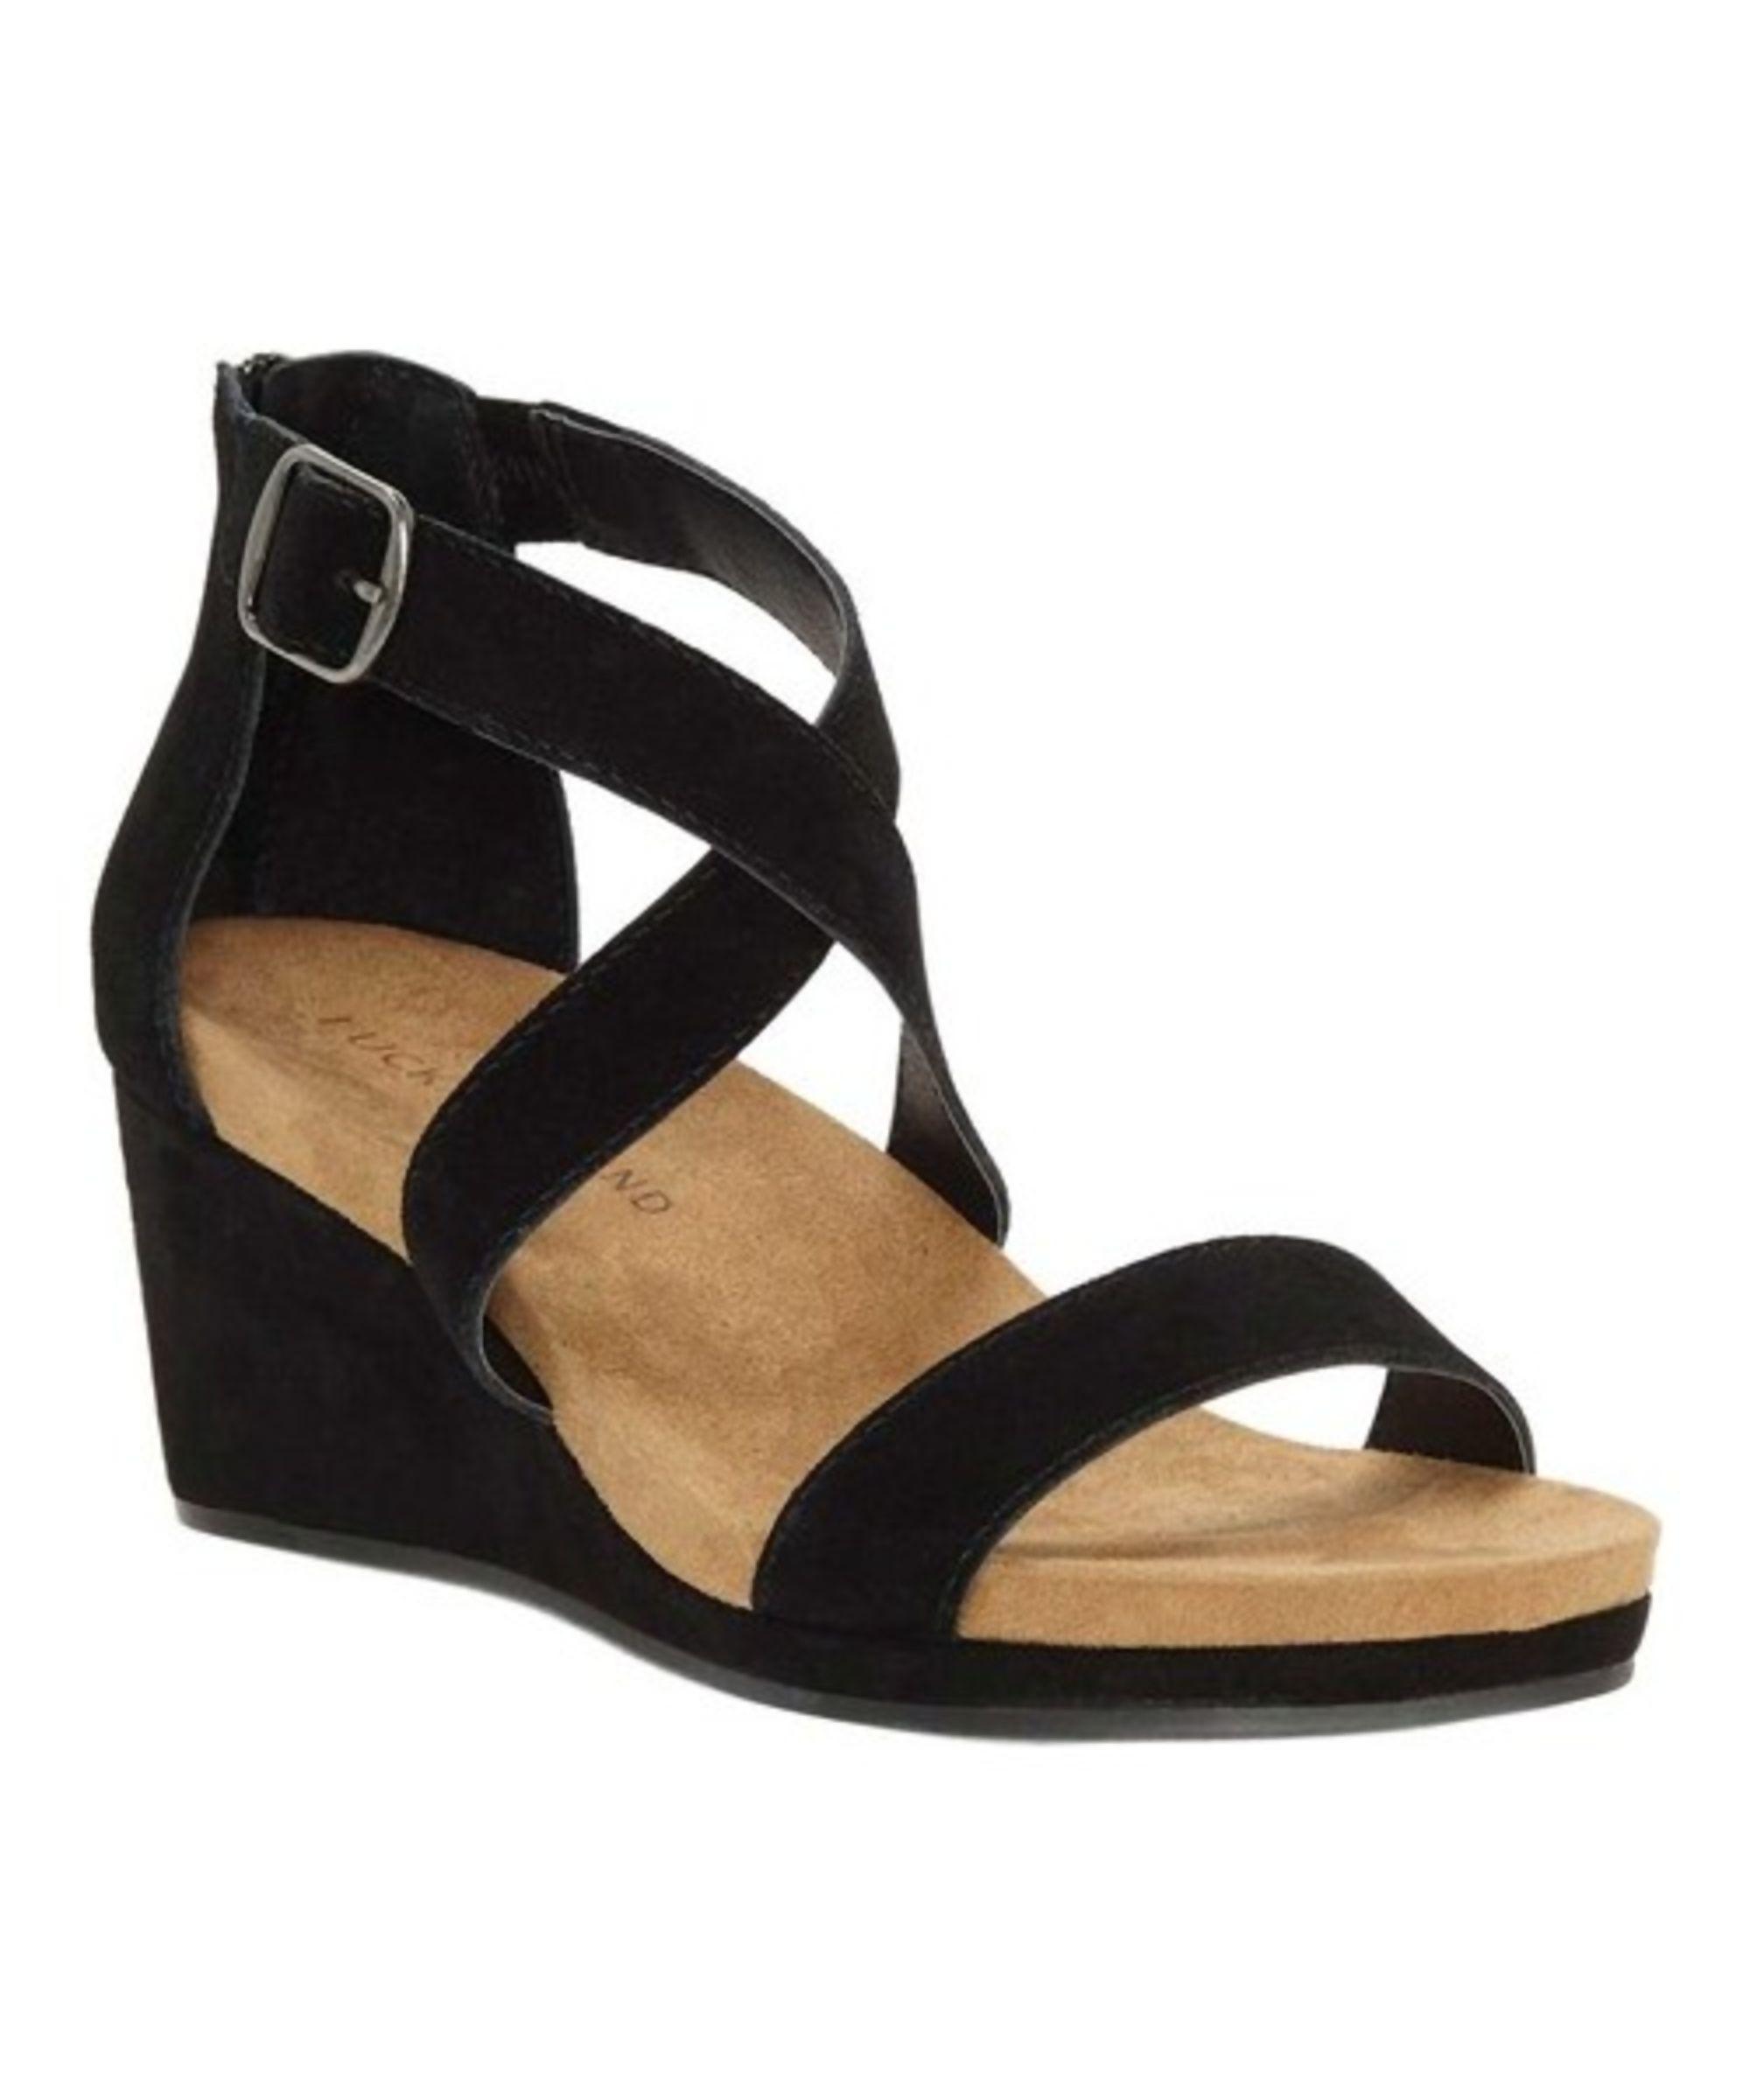 LUCKY BRAND | Lucky Brand Women's Kenadee Wedge Sandal #Shoes #Sandals #LUCKY  BRAND